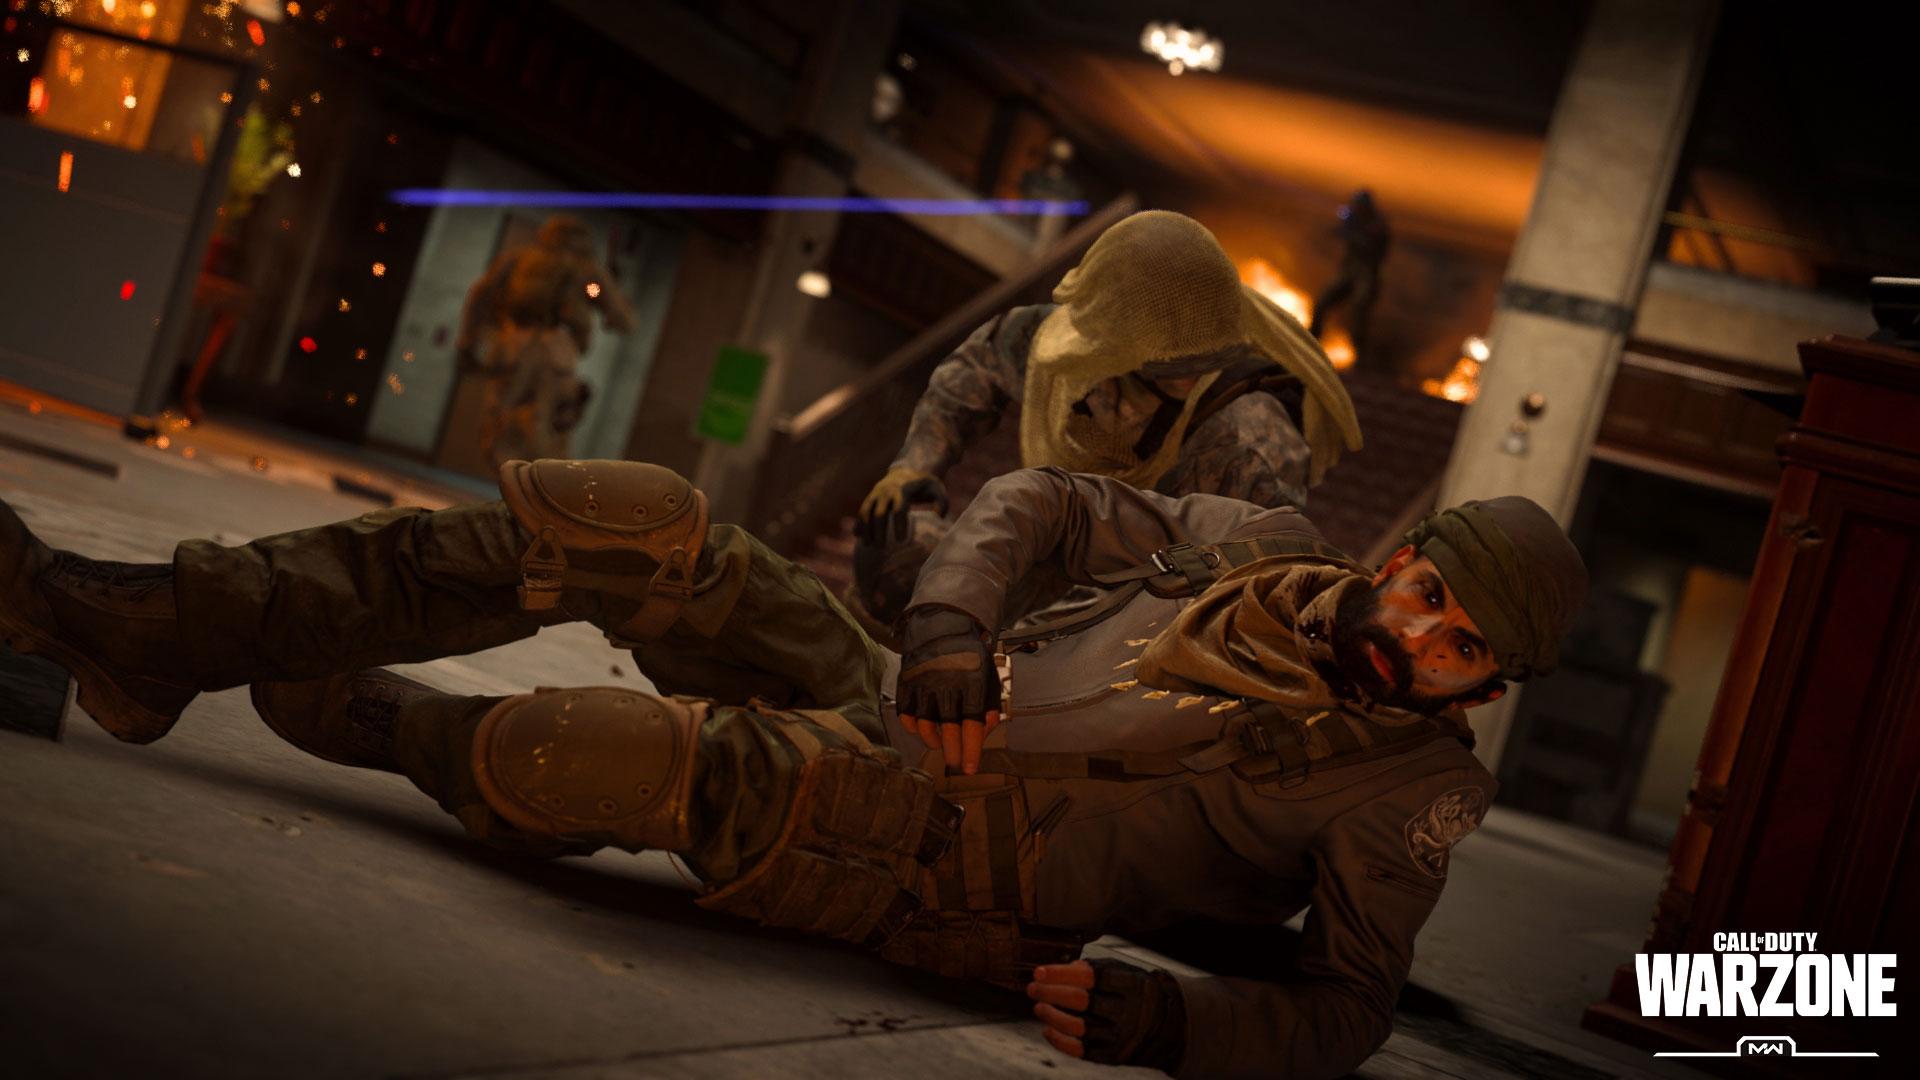 Warzone Mode Recon: Battle Royale - Image 1